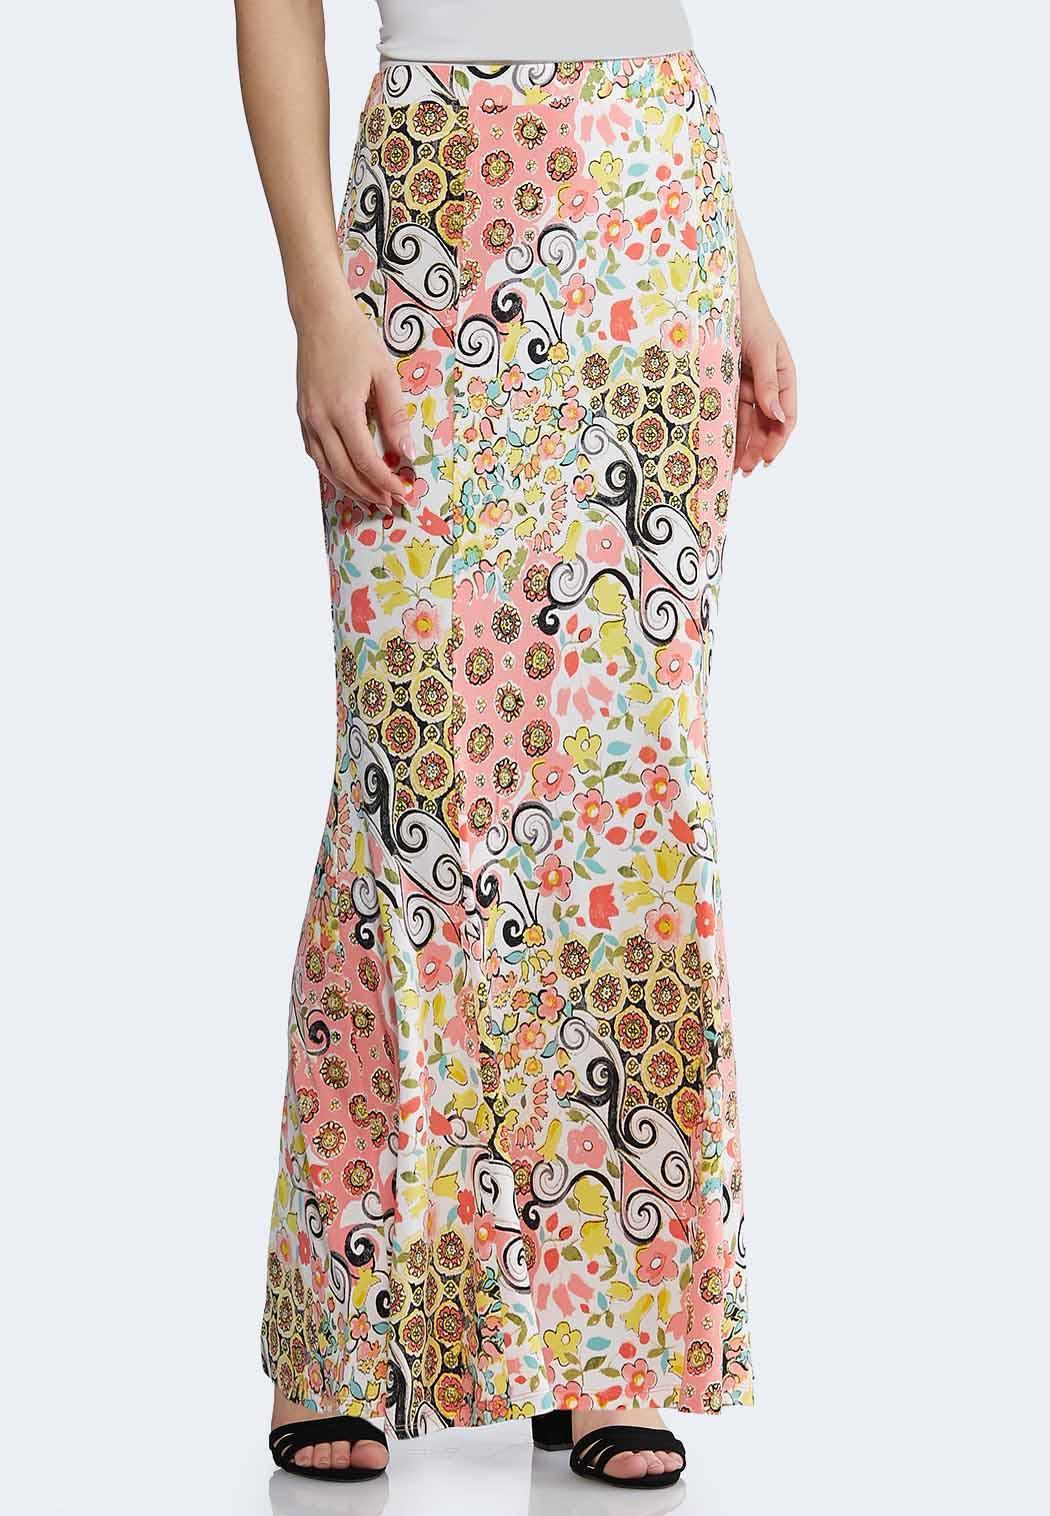 6fa43cd13b8 Plus Size Spring Floral Mermaid Maxi Skirt Maxi Cato Fashions